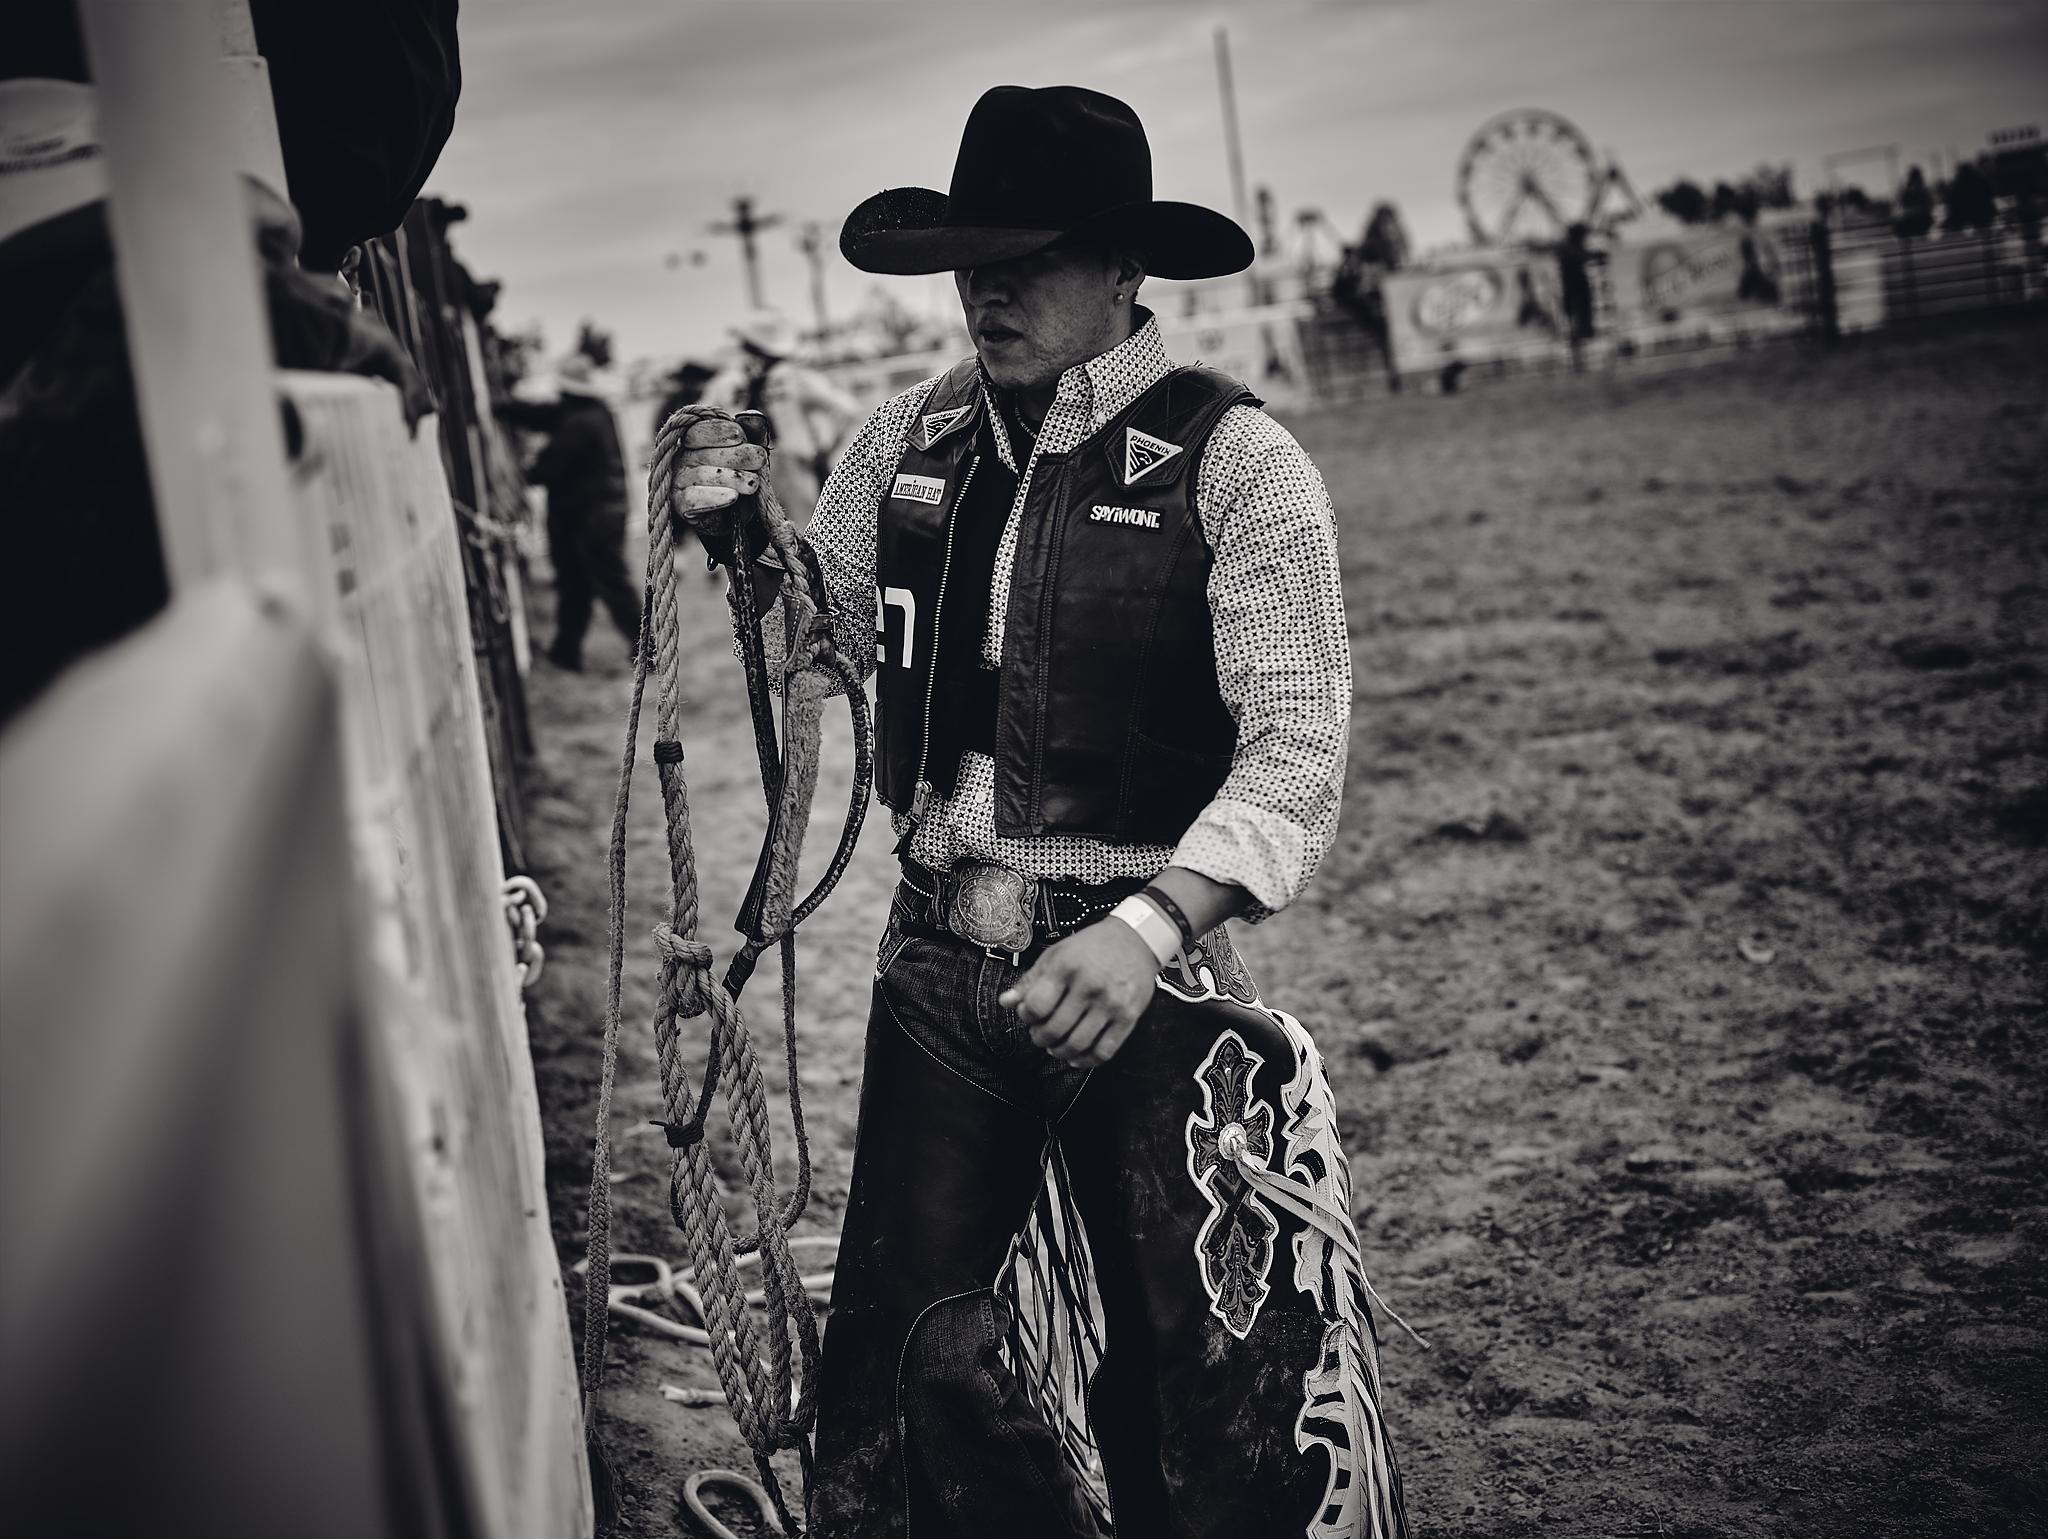 arizona photographer, arizona photography, rodeo, rodeo photography, rodeo photographer, photographer of the american west